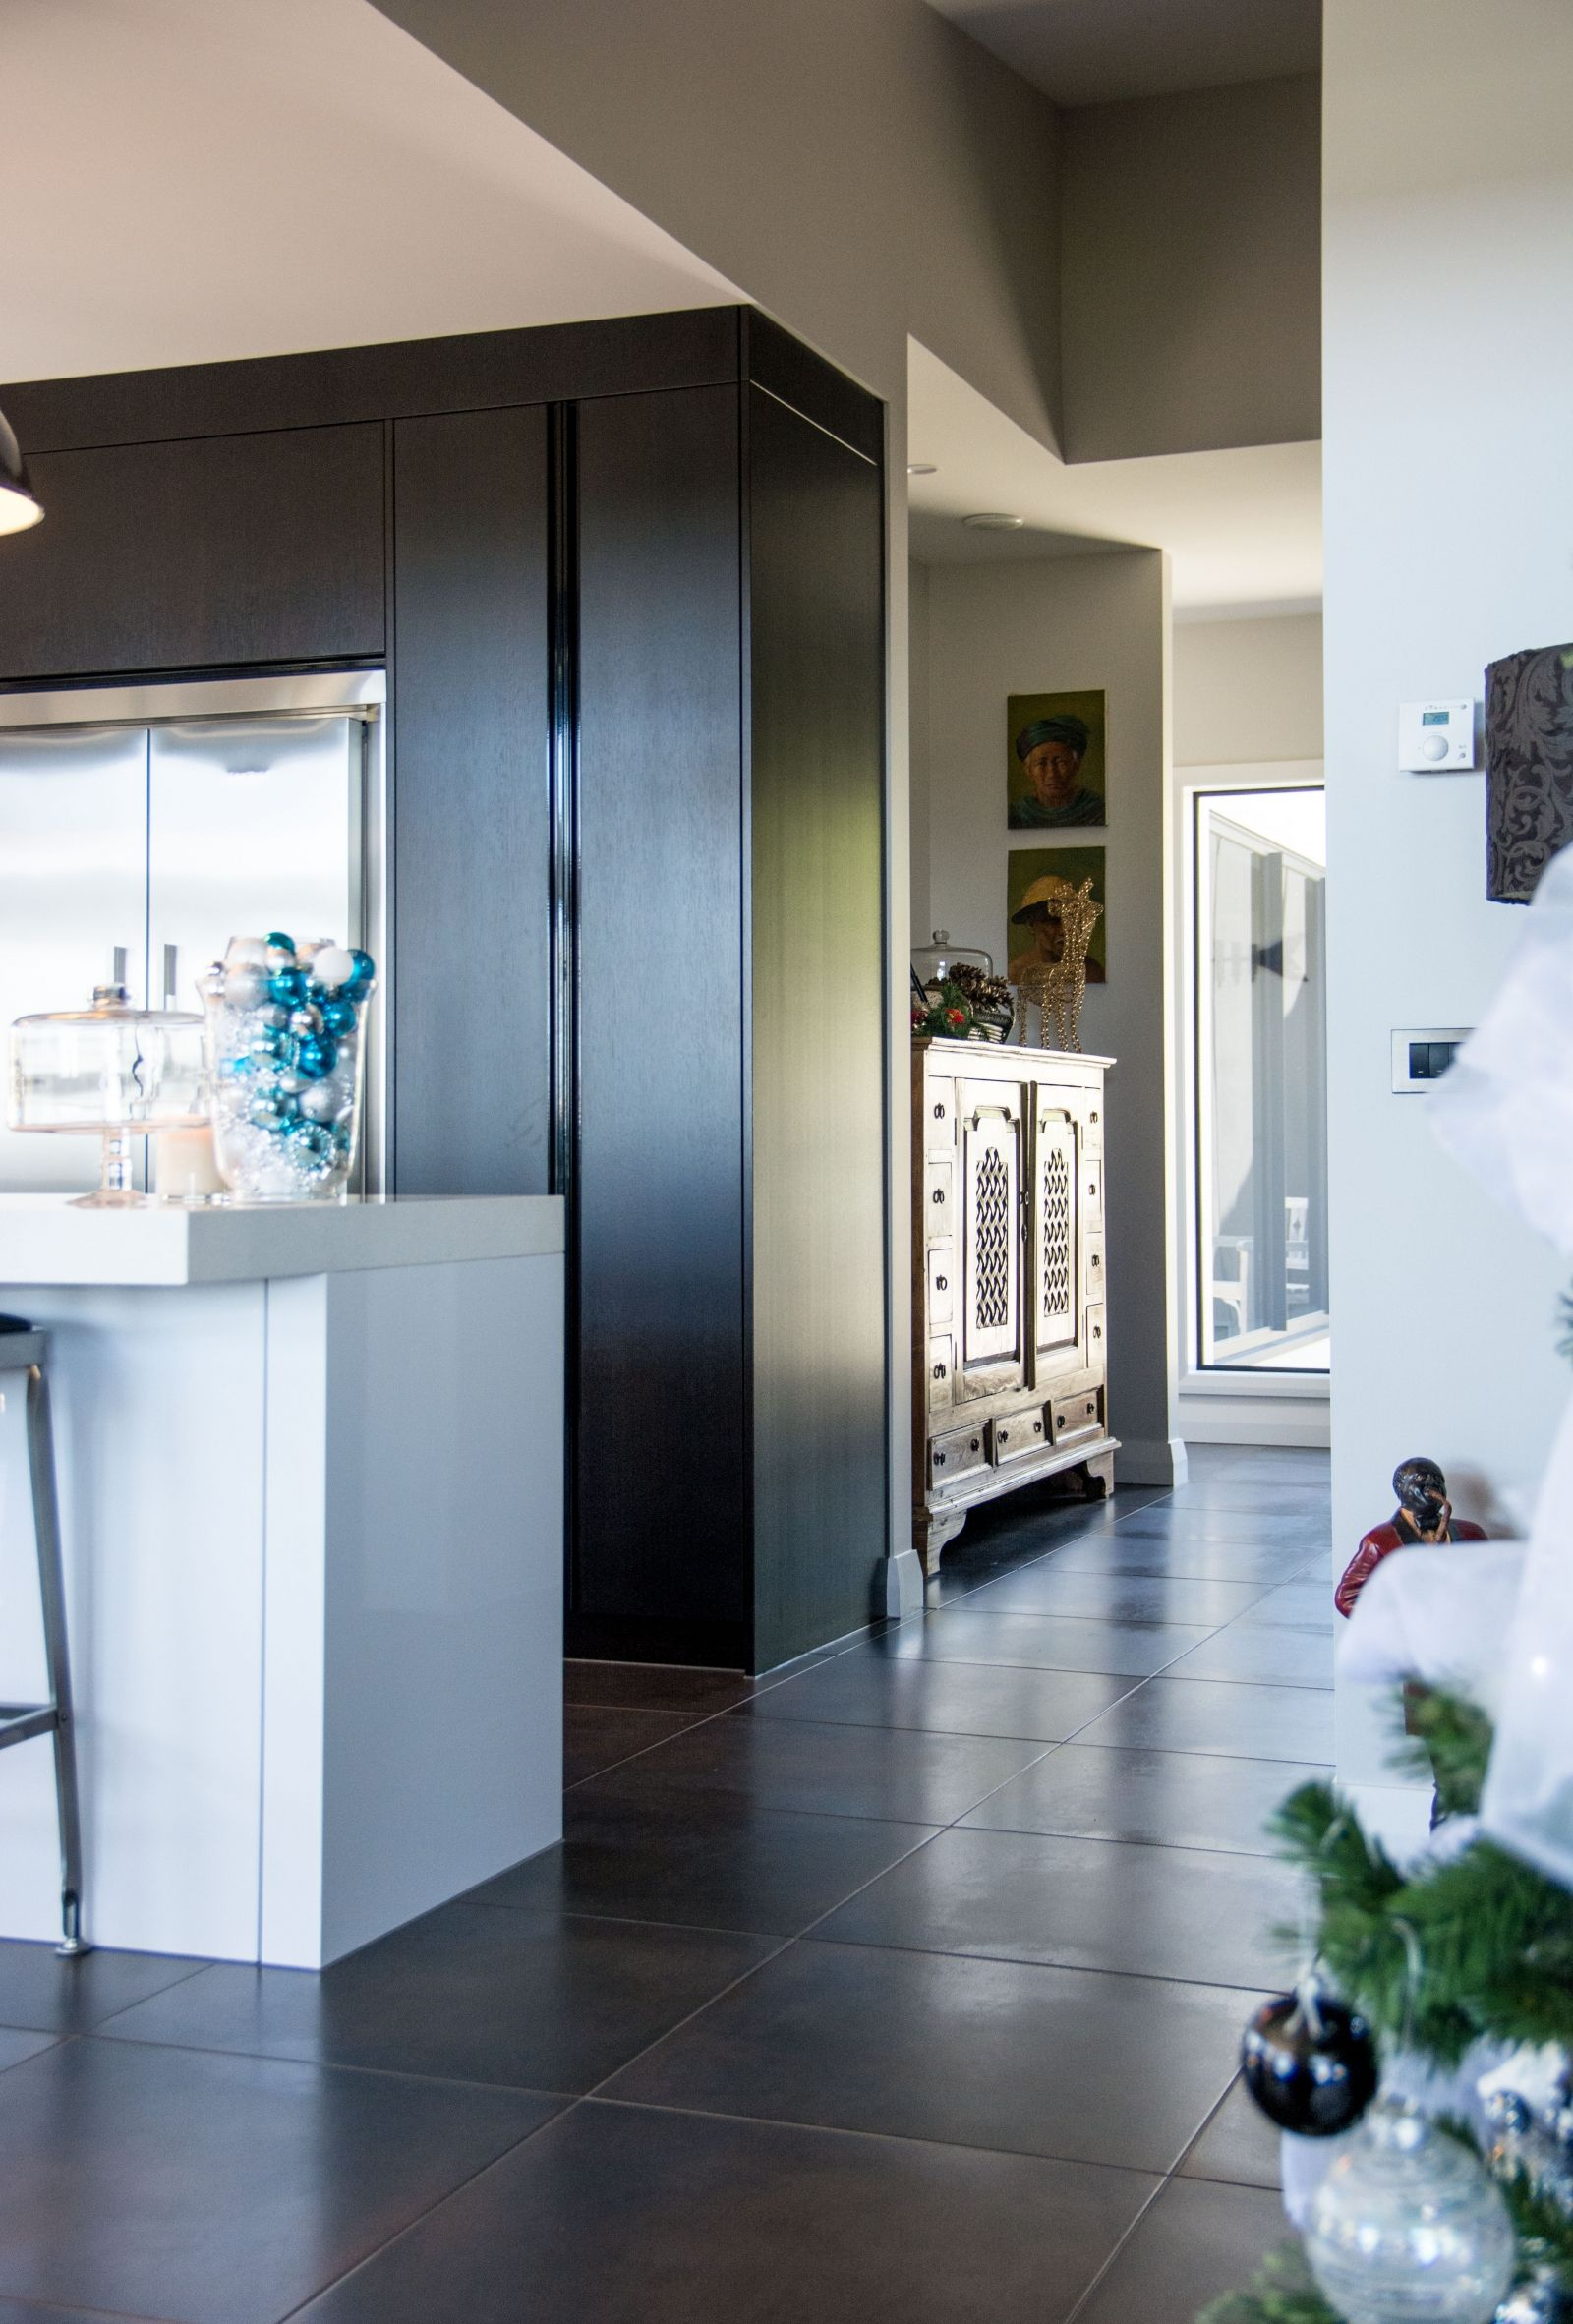 past bathroom interior design projects surfacedesign on bathroom renovation ideas nz id=36081